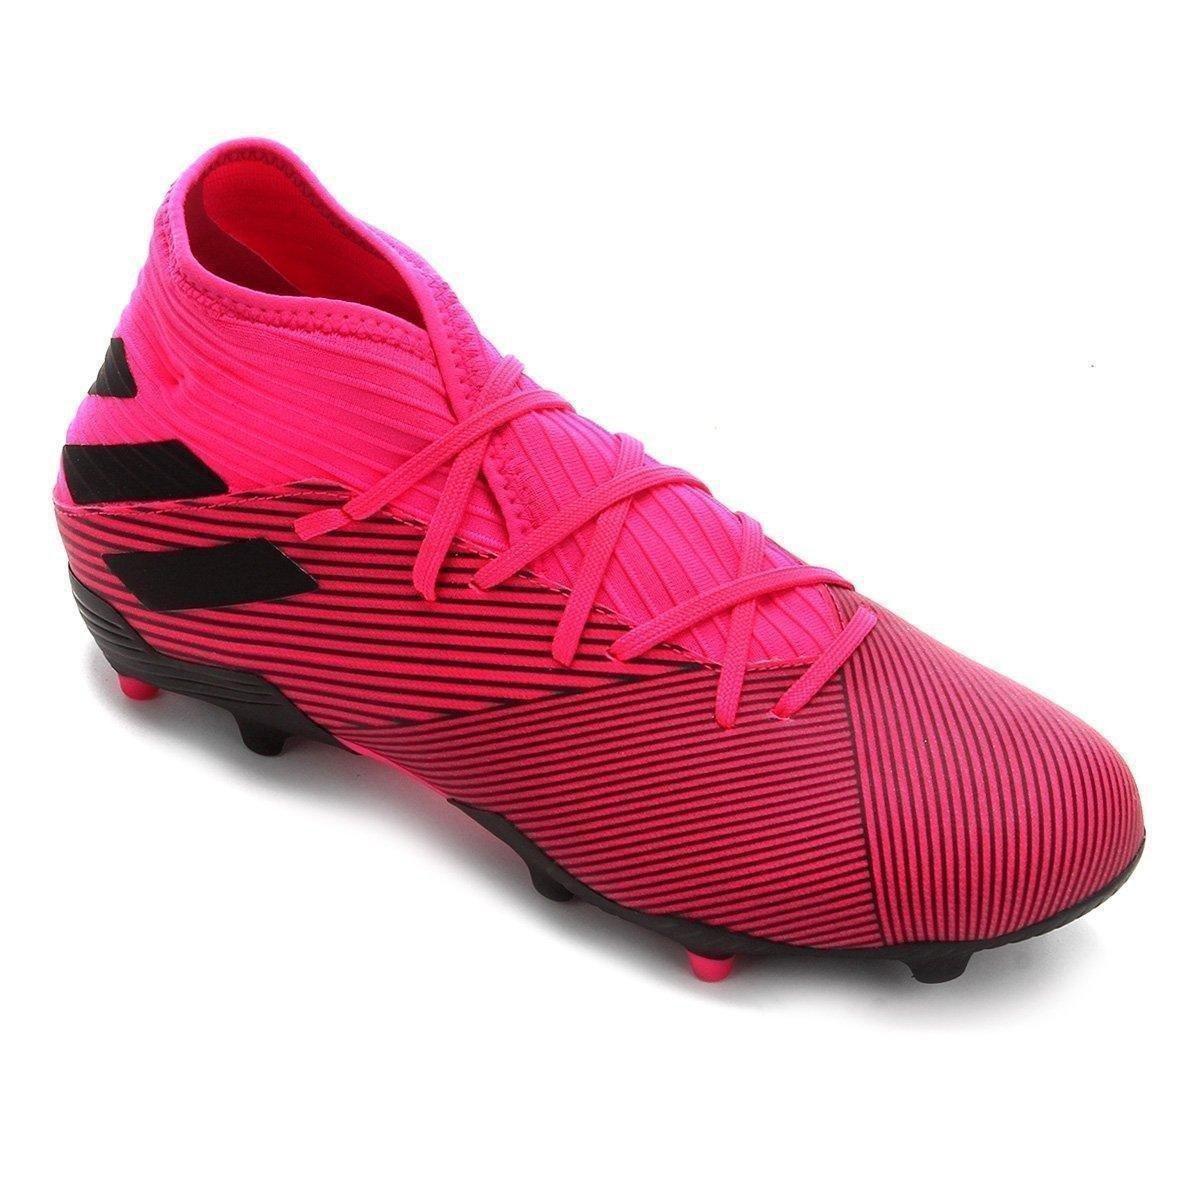 Chuteira Campo Adidas Nemeziz 19 3 FG - Pink e Preto